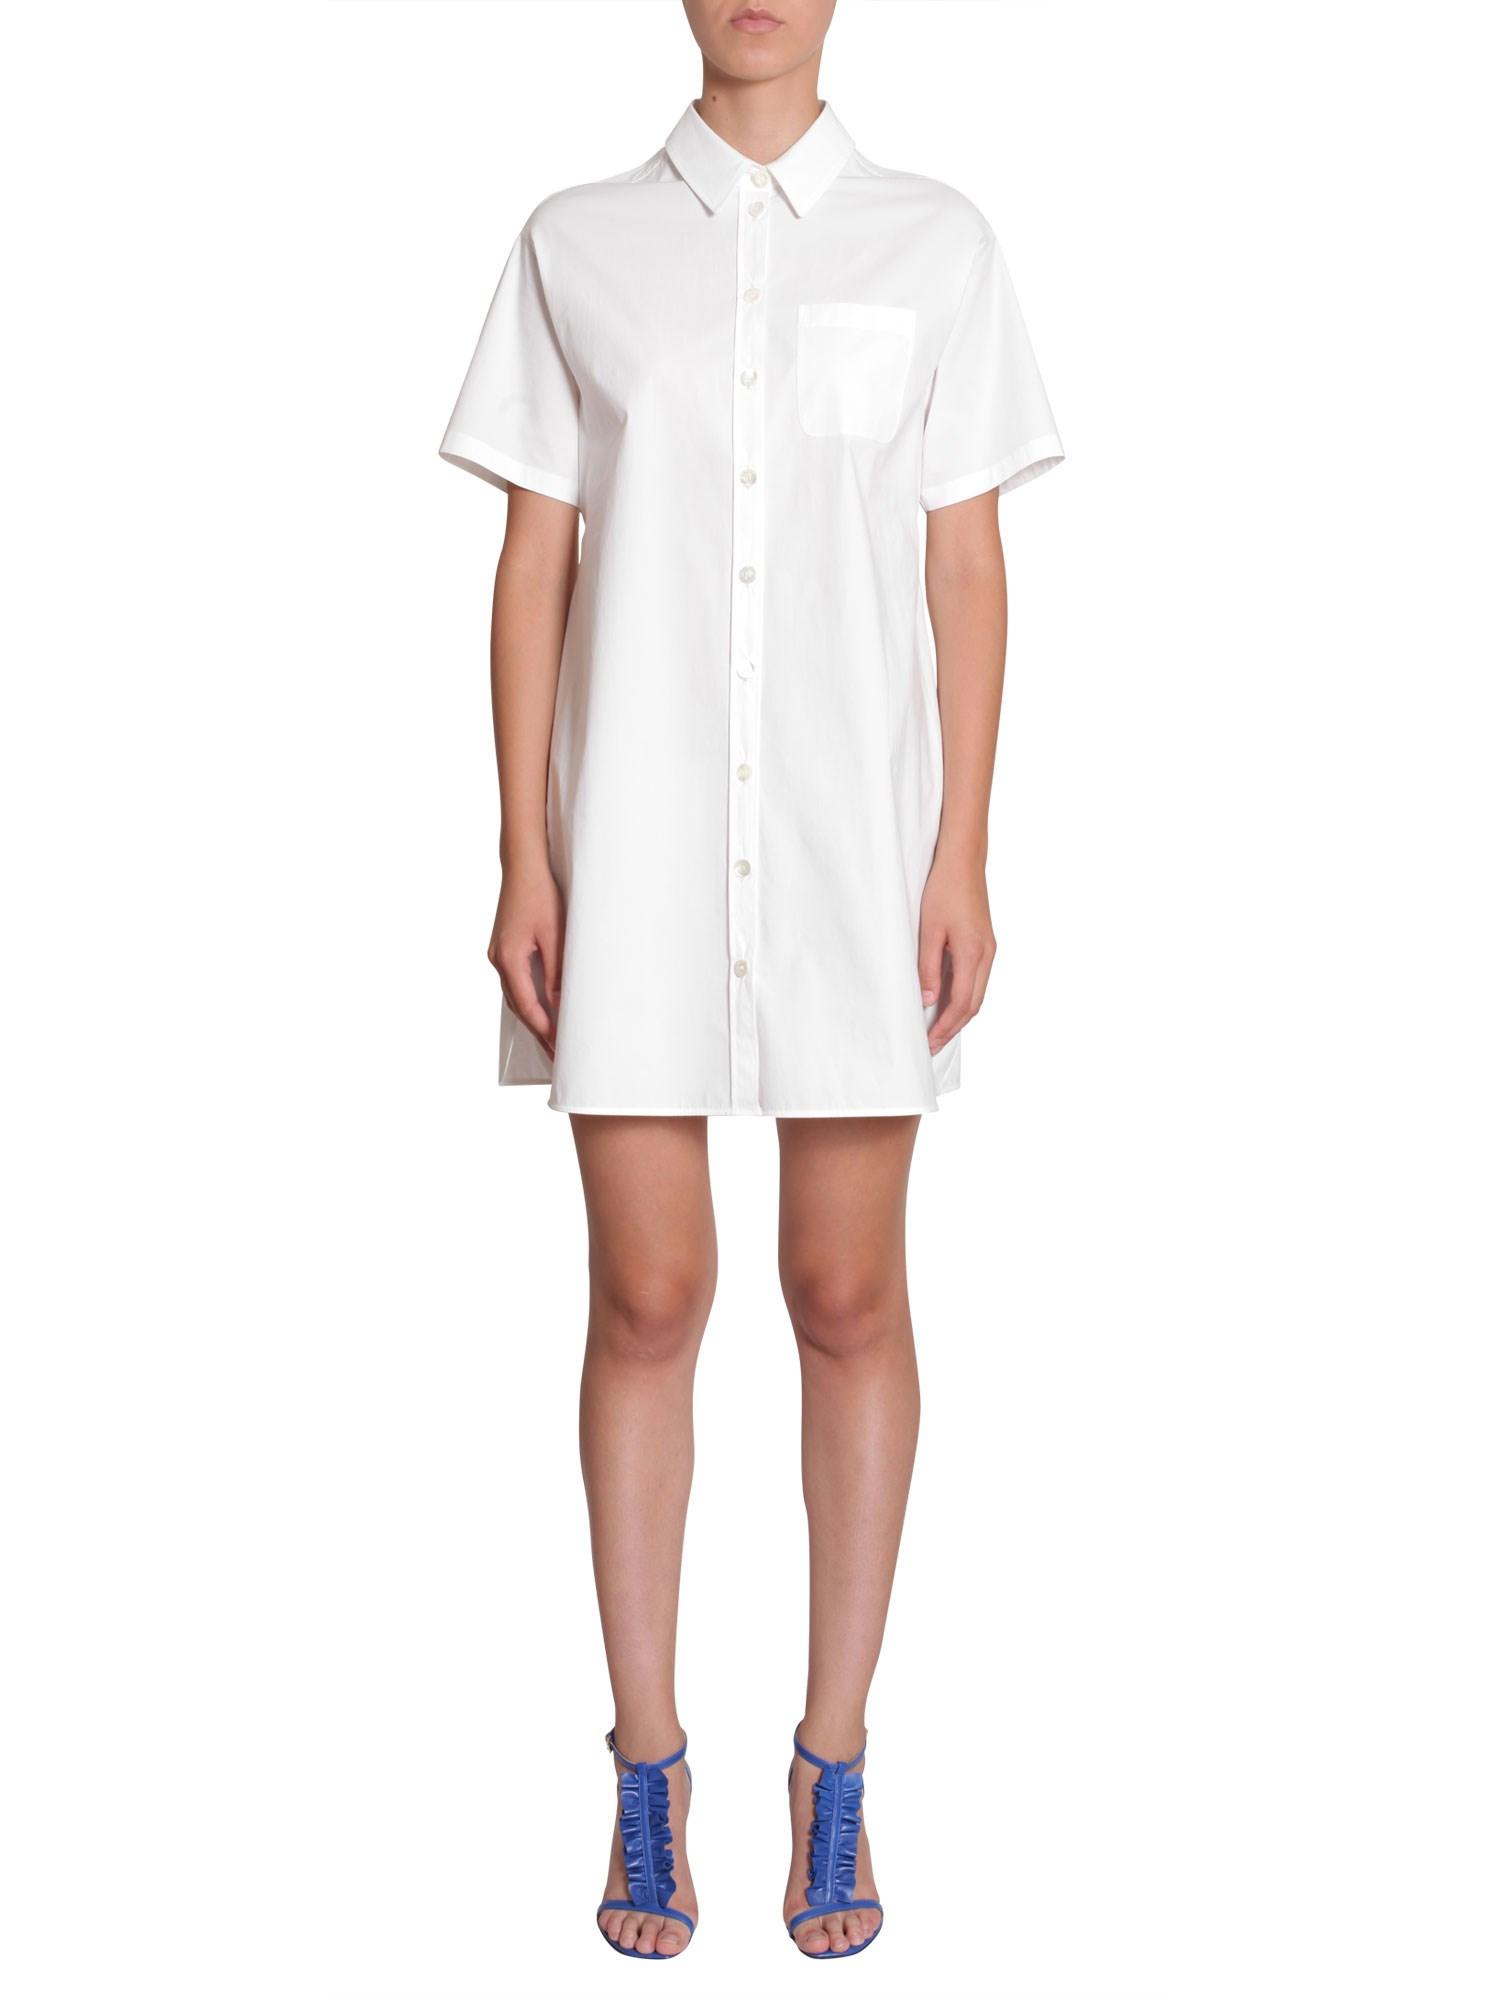 Boutique moschino shirt dress - boutique moschino - Modalova